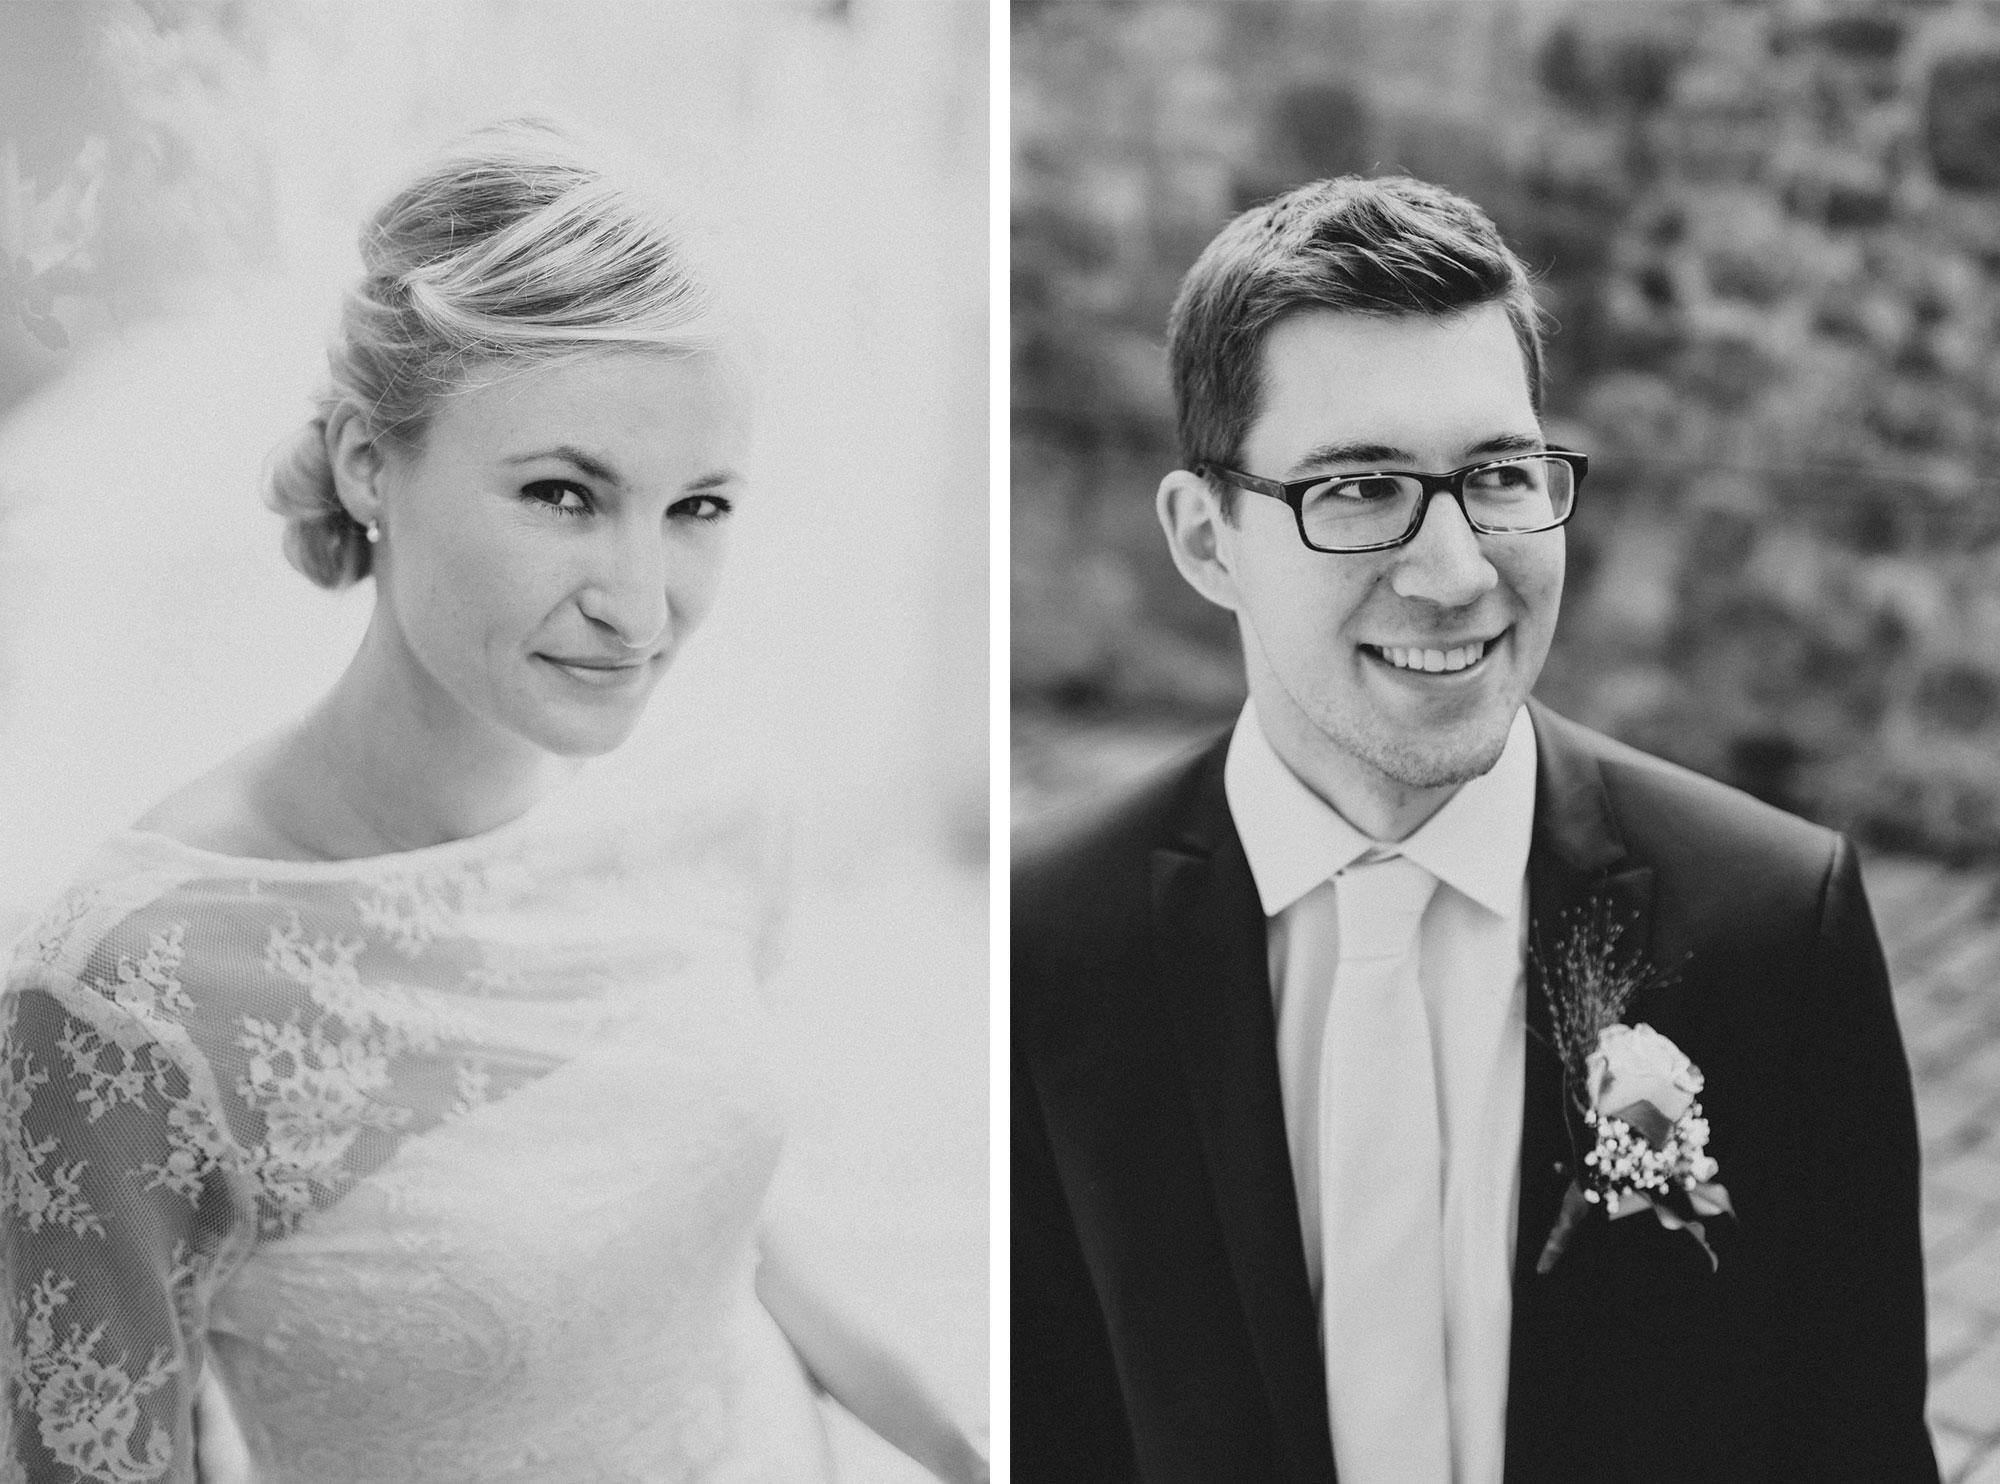 Hochzeitsfotografie-Tuebingen-Doro-Stefan-14